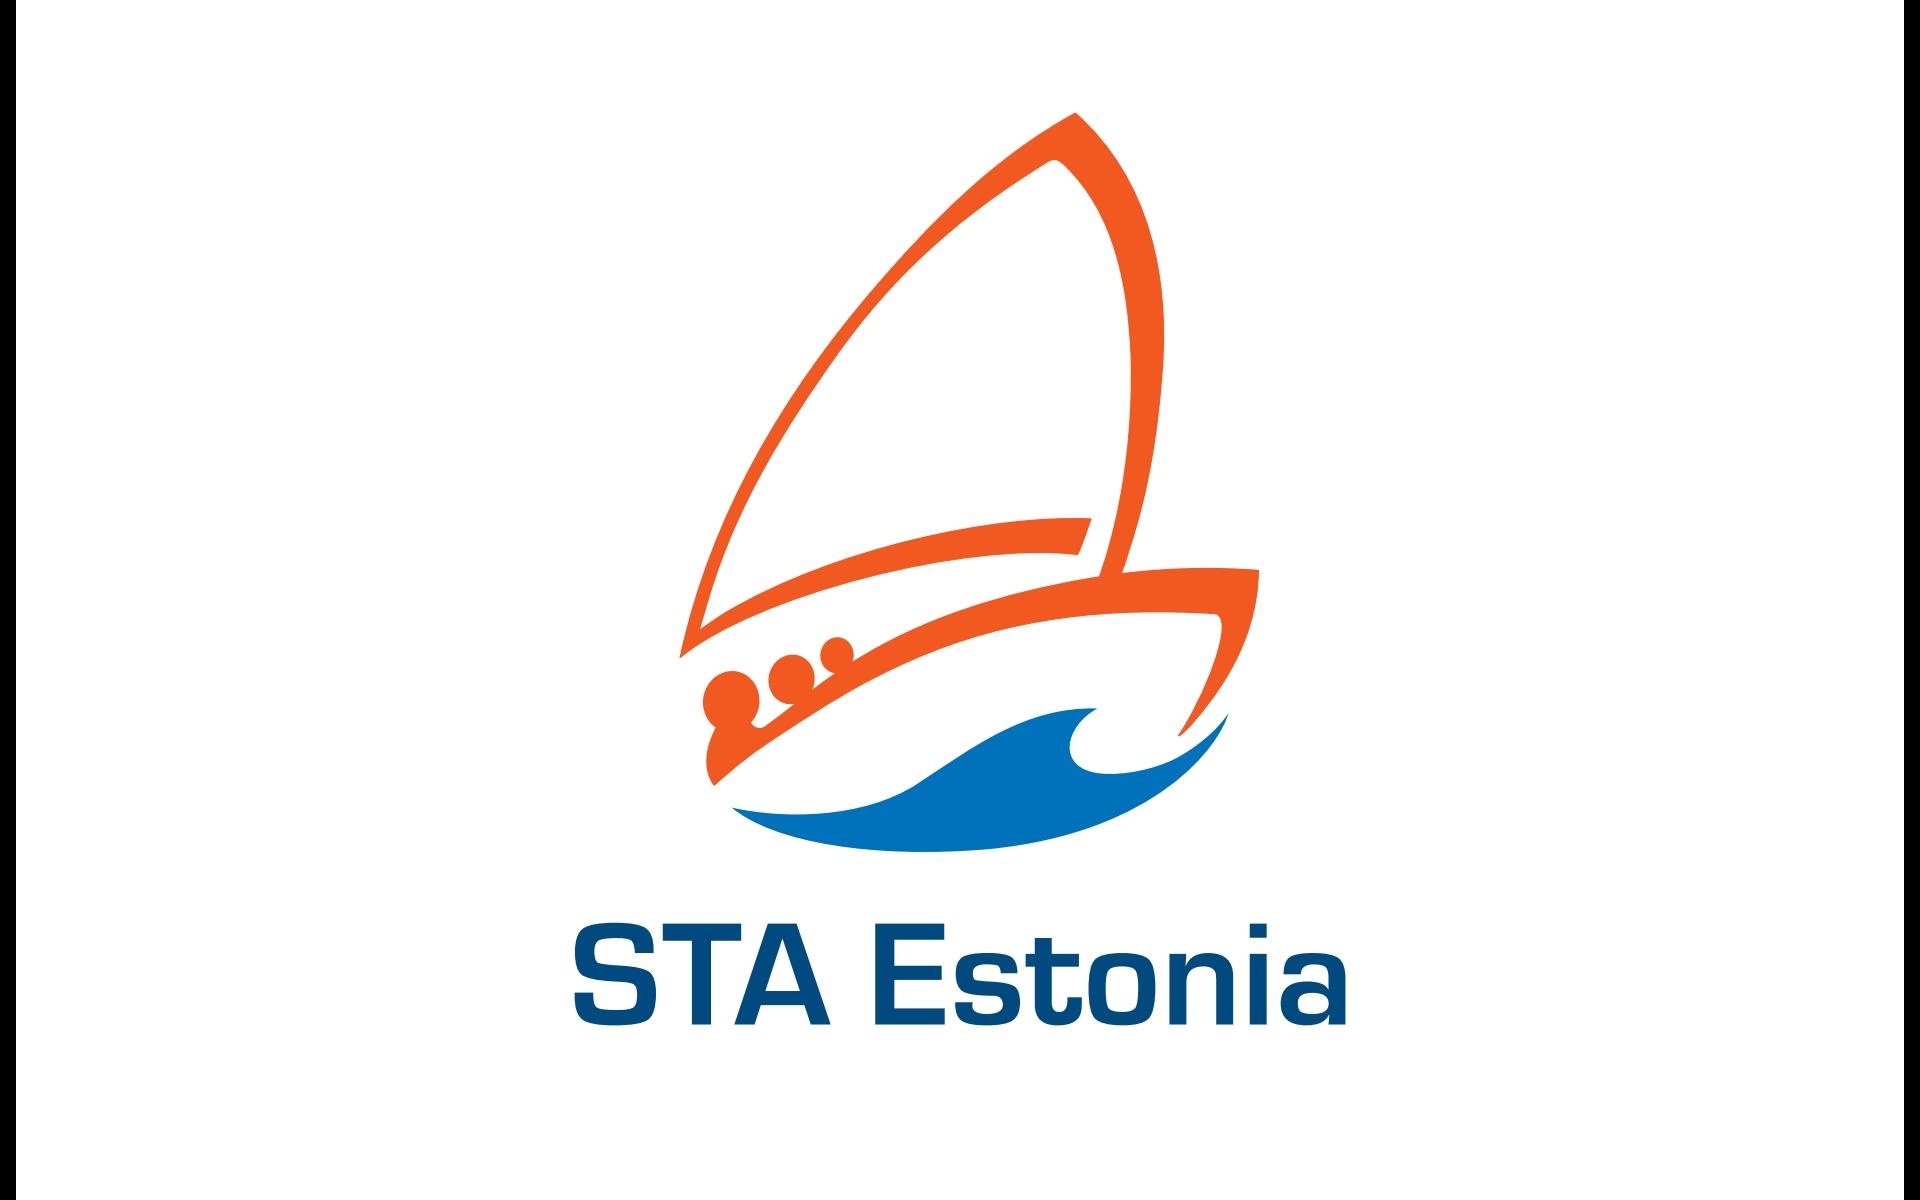 Non-profit group of the Estonian Youth Sailing Club STA Estonia